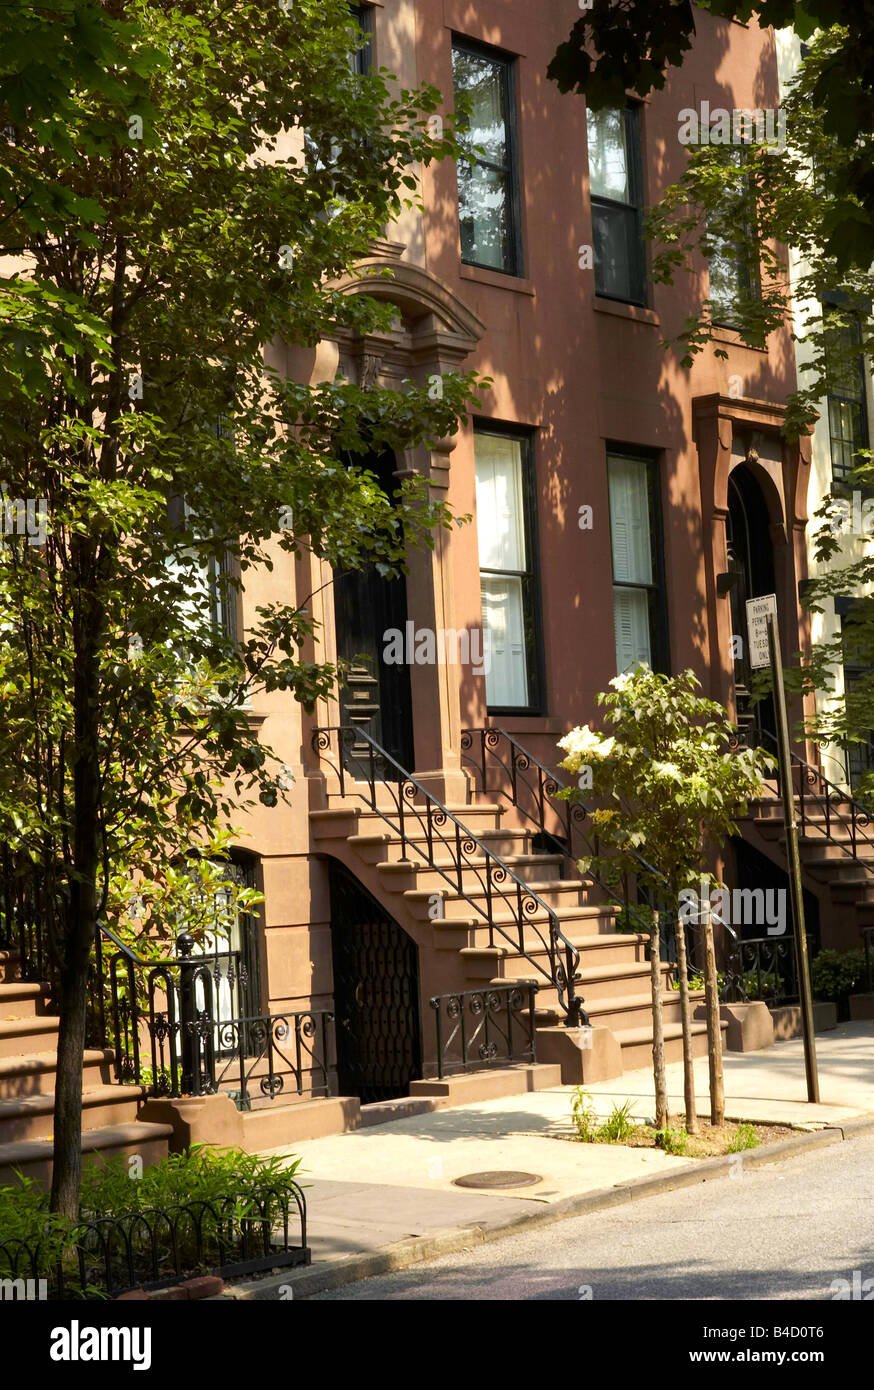 Garden Place Brooklyn New York City USA Stock Photo: 19955046 - Alamy